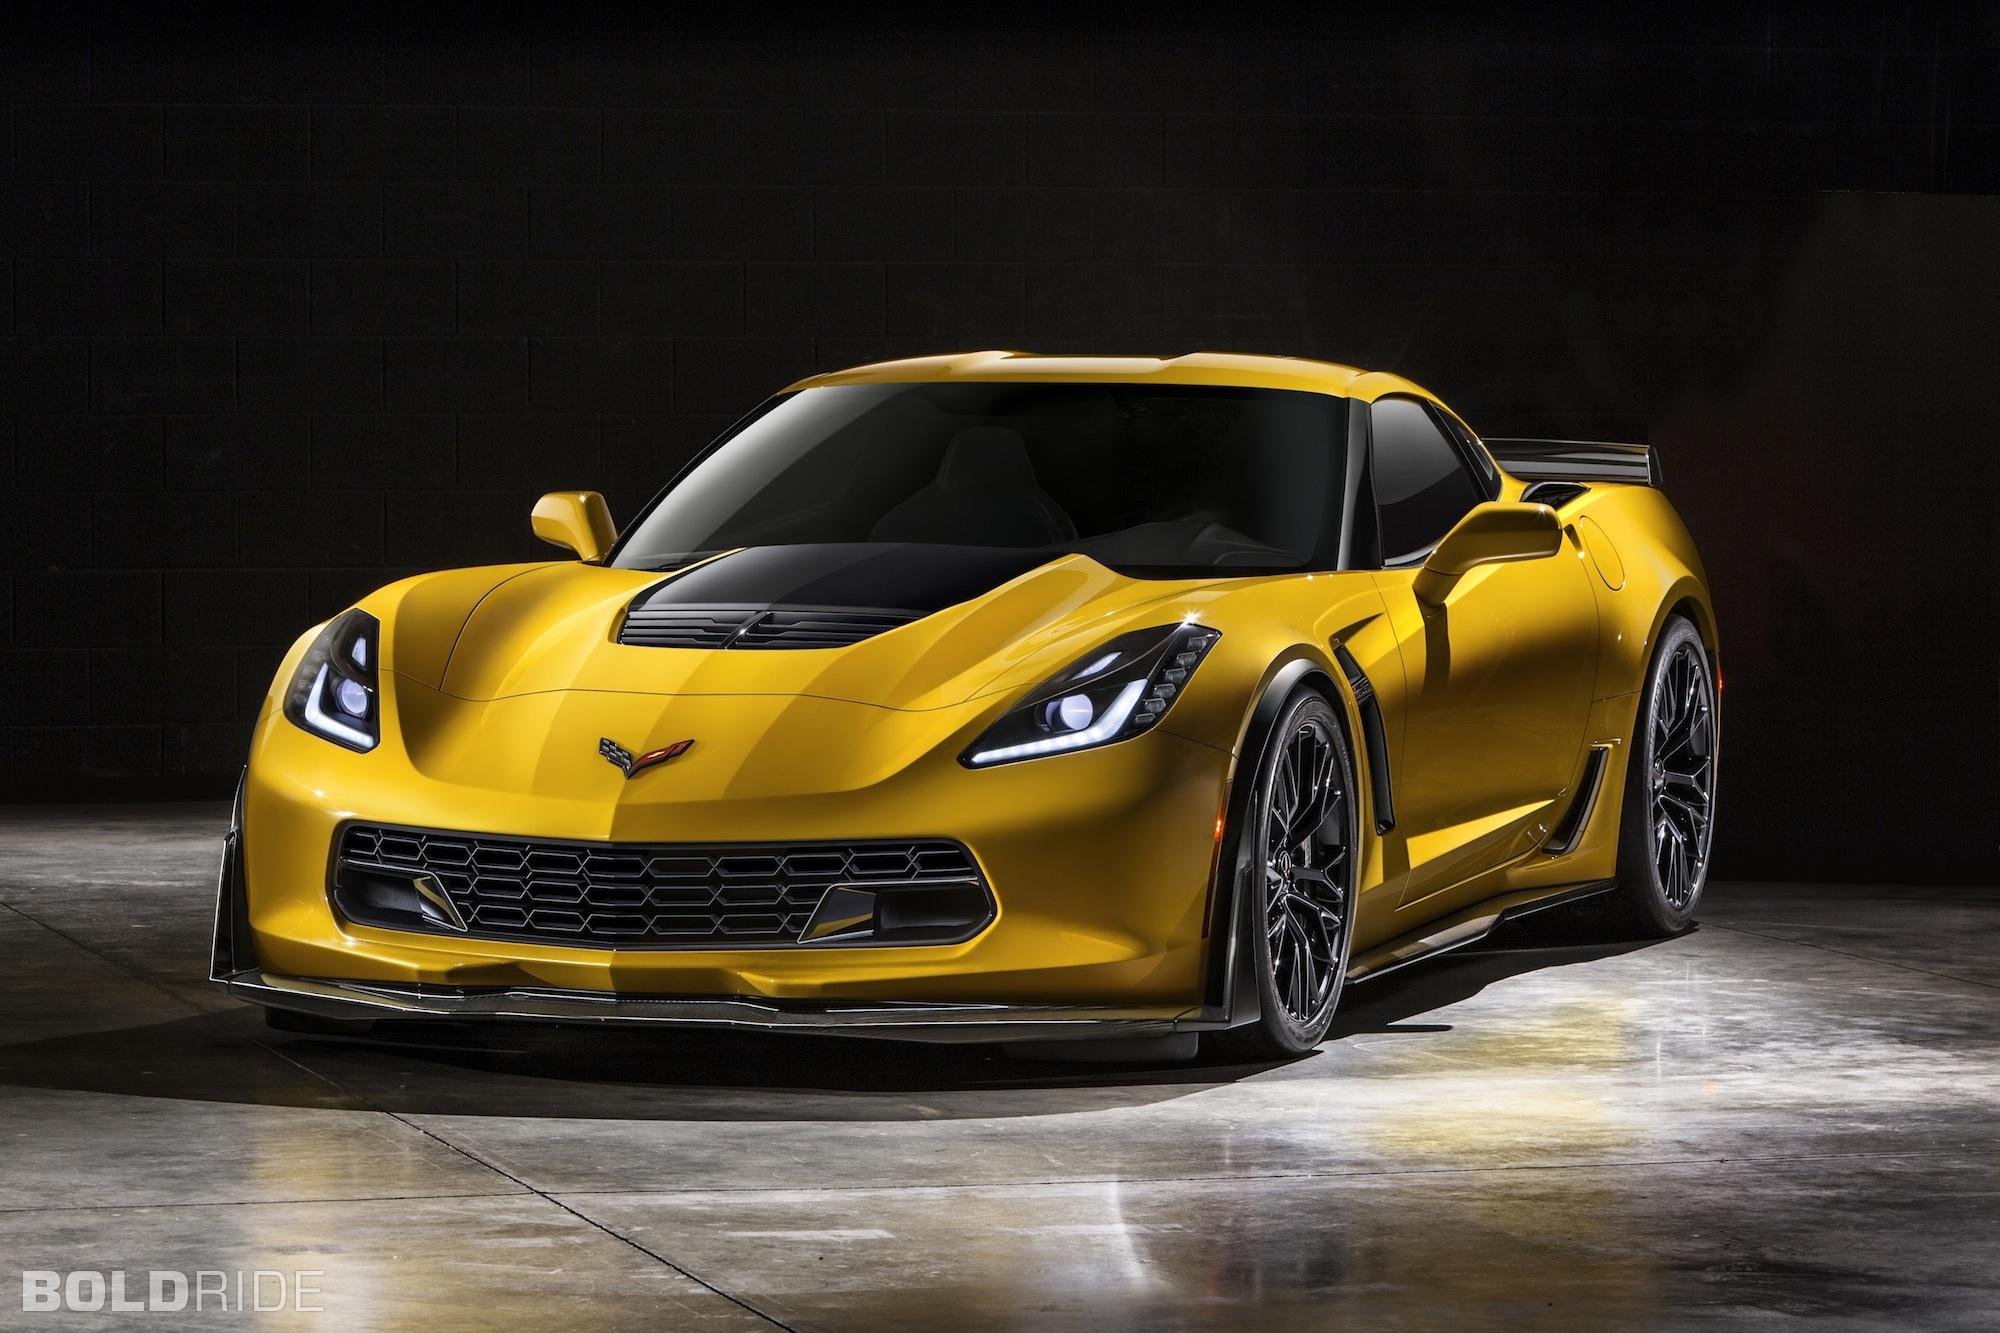 2015 Chevrolet Corvette Z06 1280 x 1080